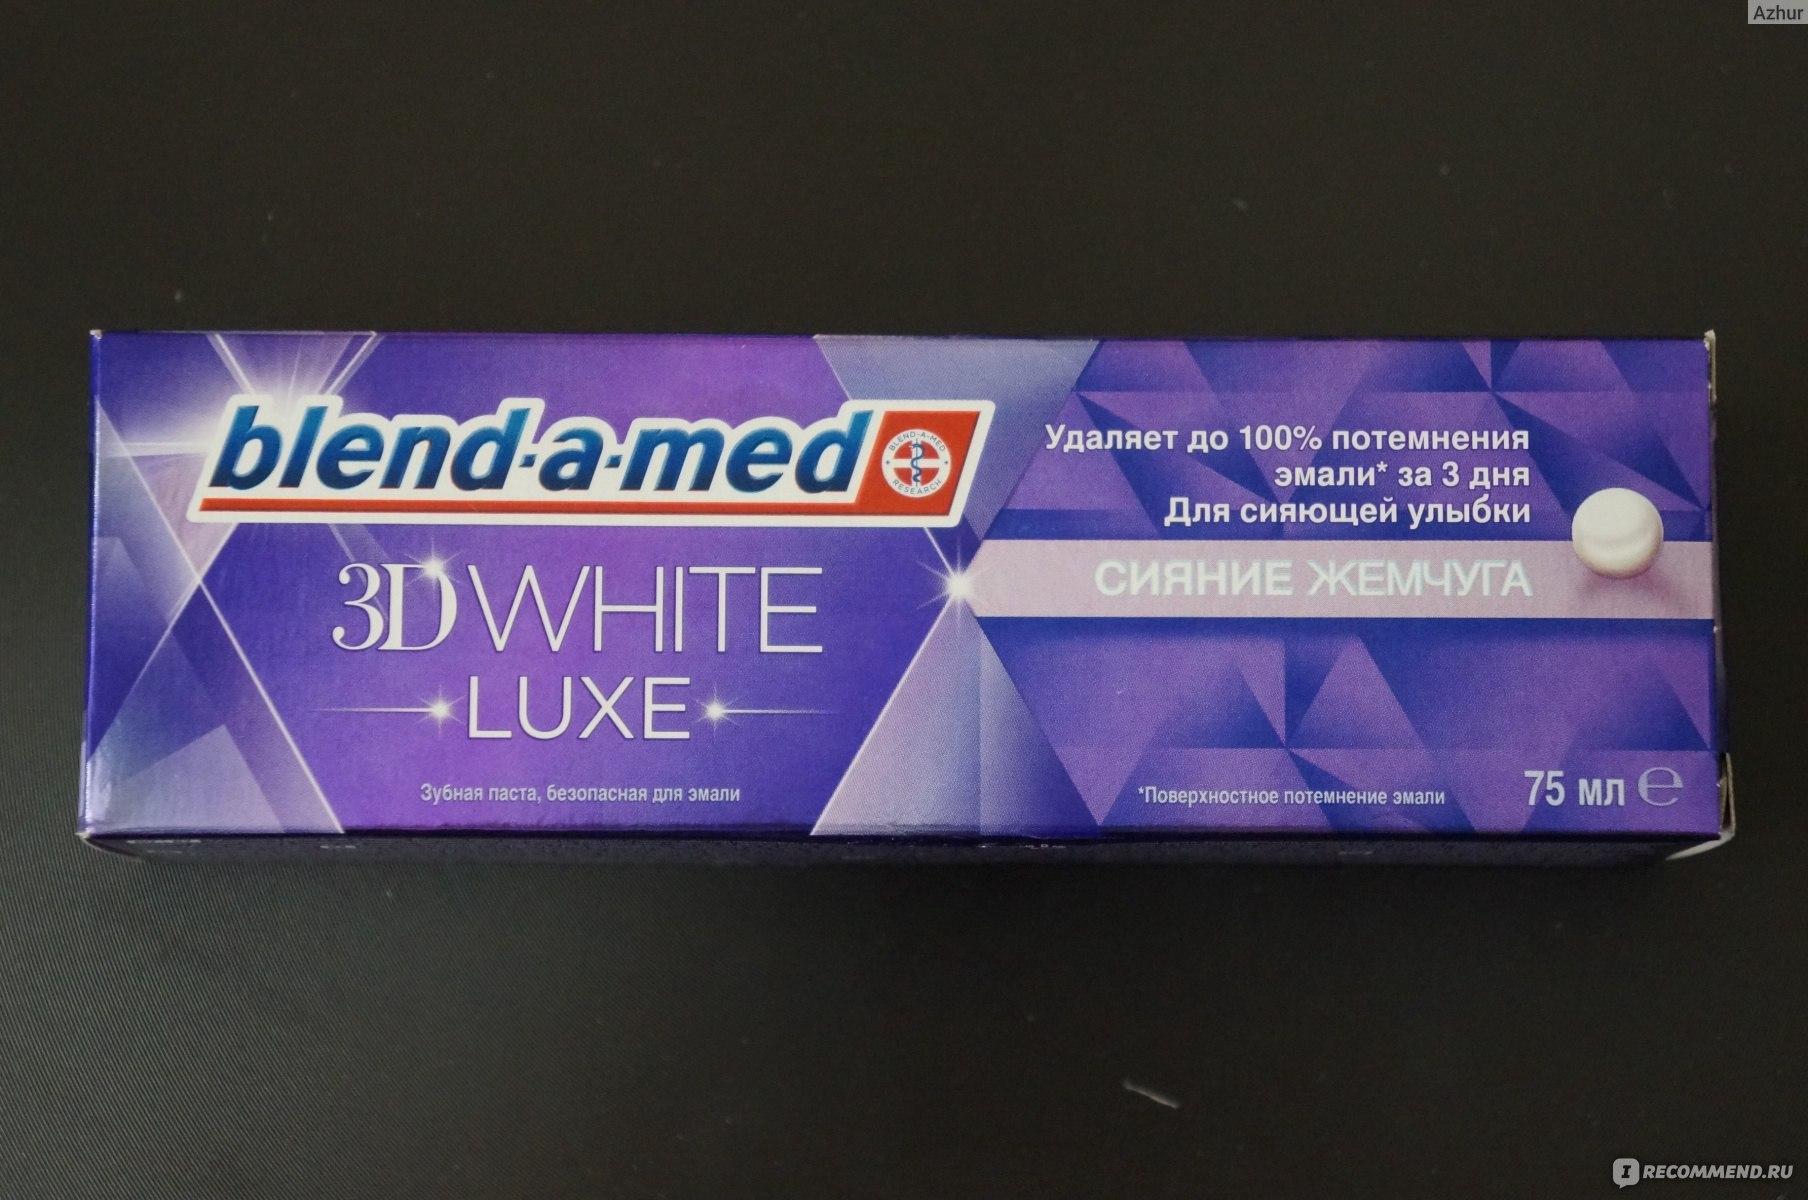 Бьюти-новинка недели: Blend a-med 3D White Luxe Гламур картинки